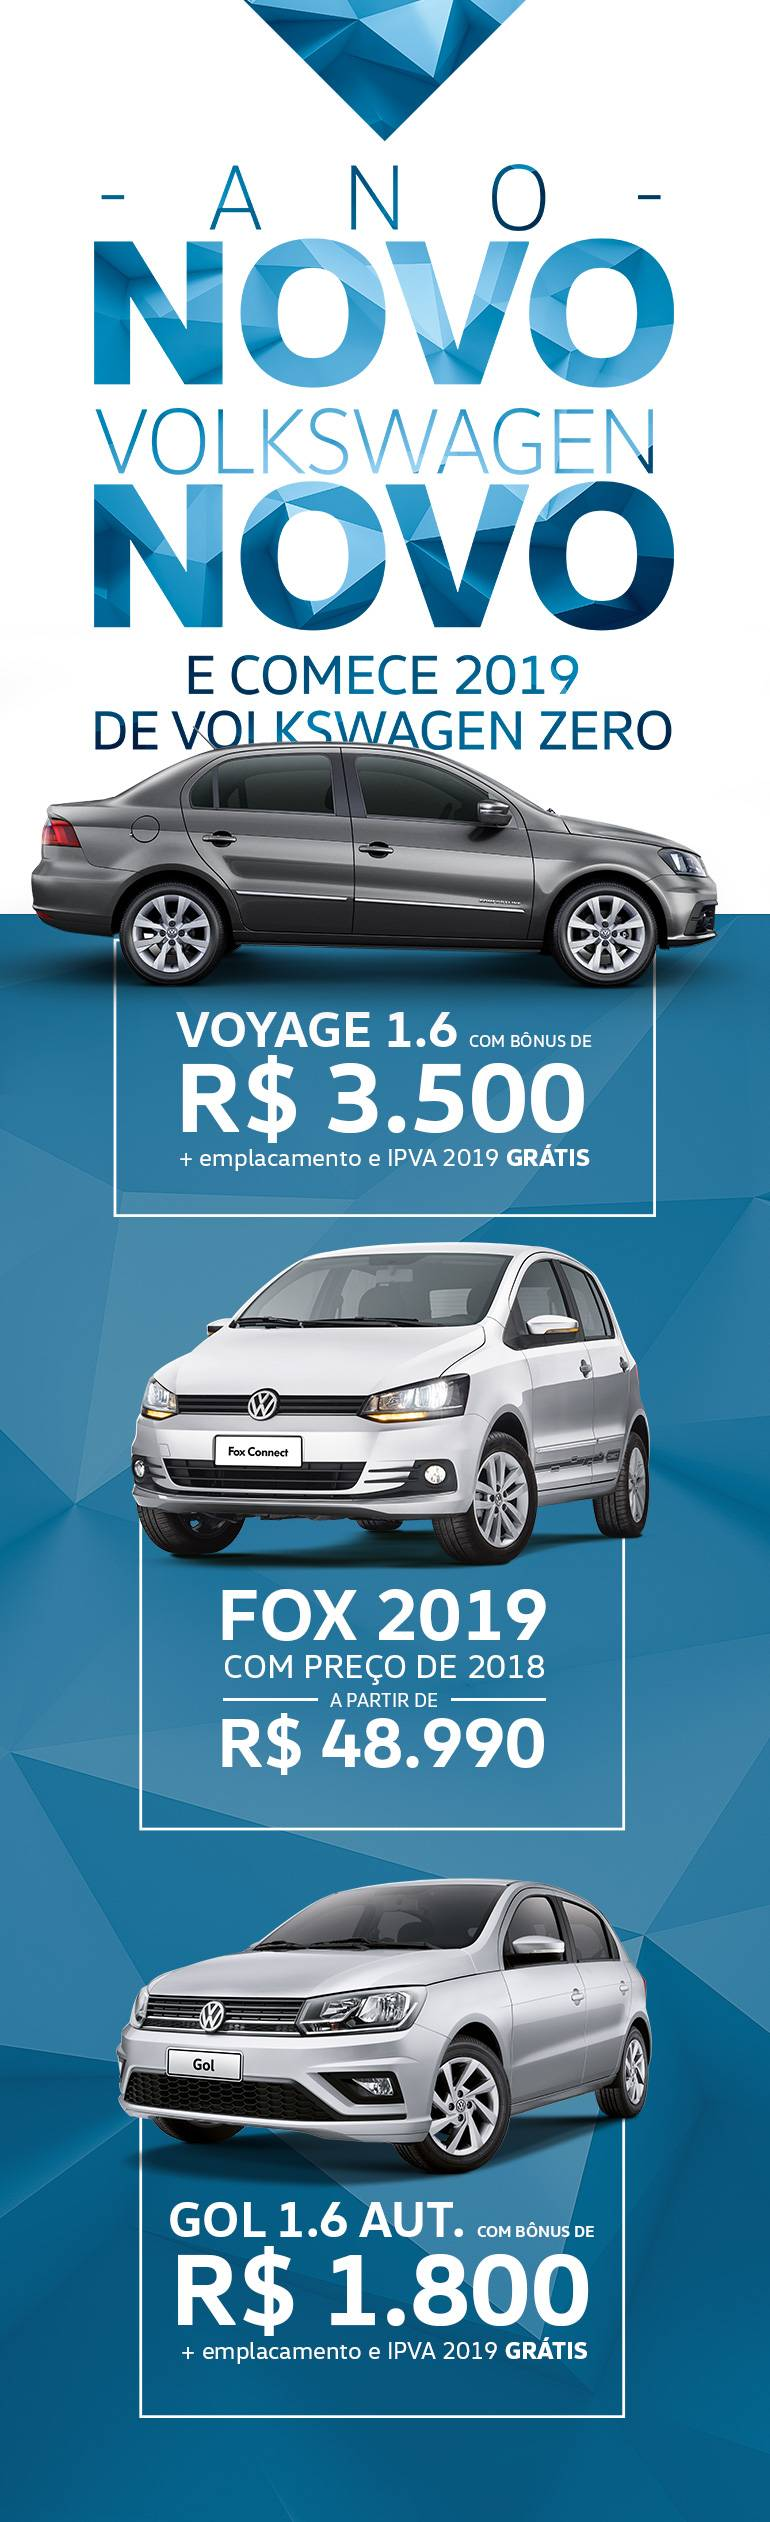 Ano Novo, VW Novo